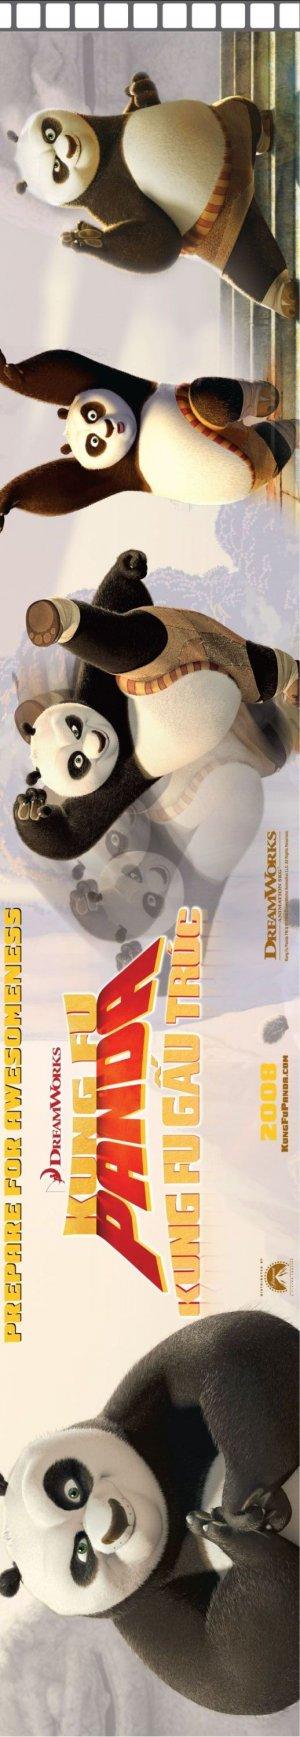 Kung Fu Panda 518x3000